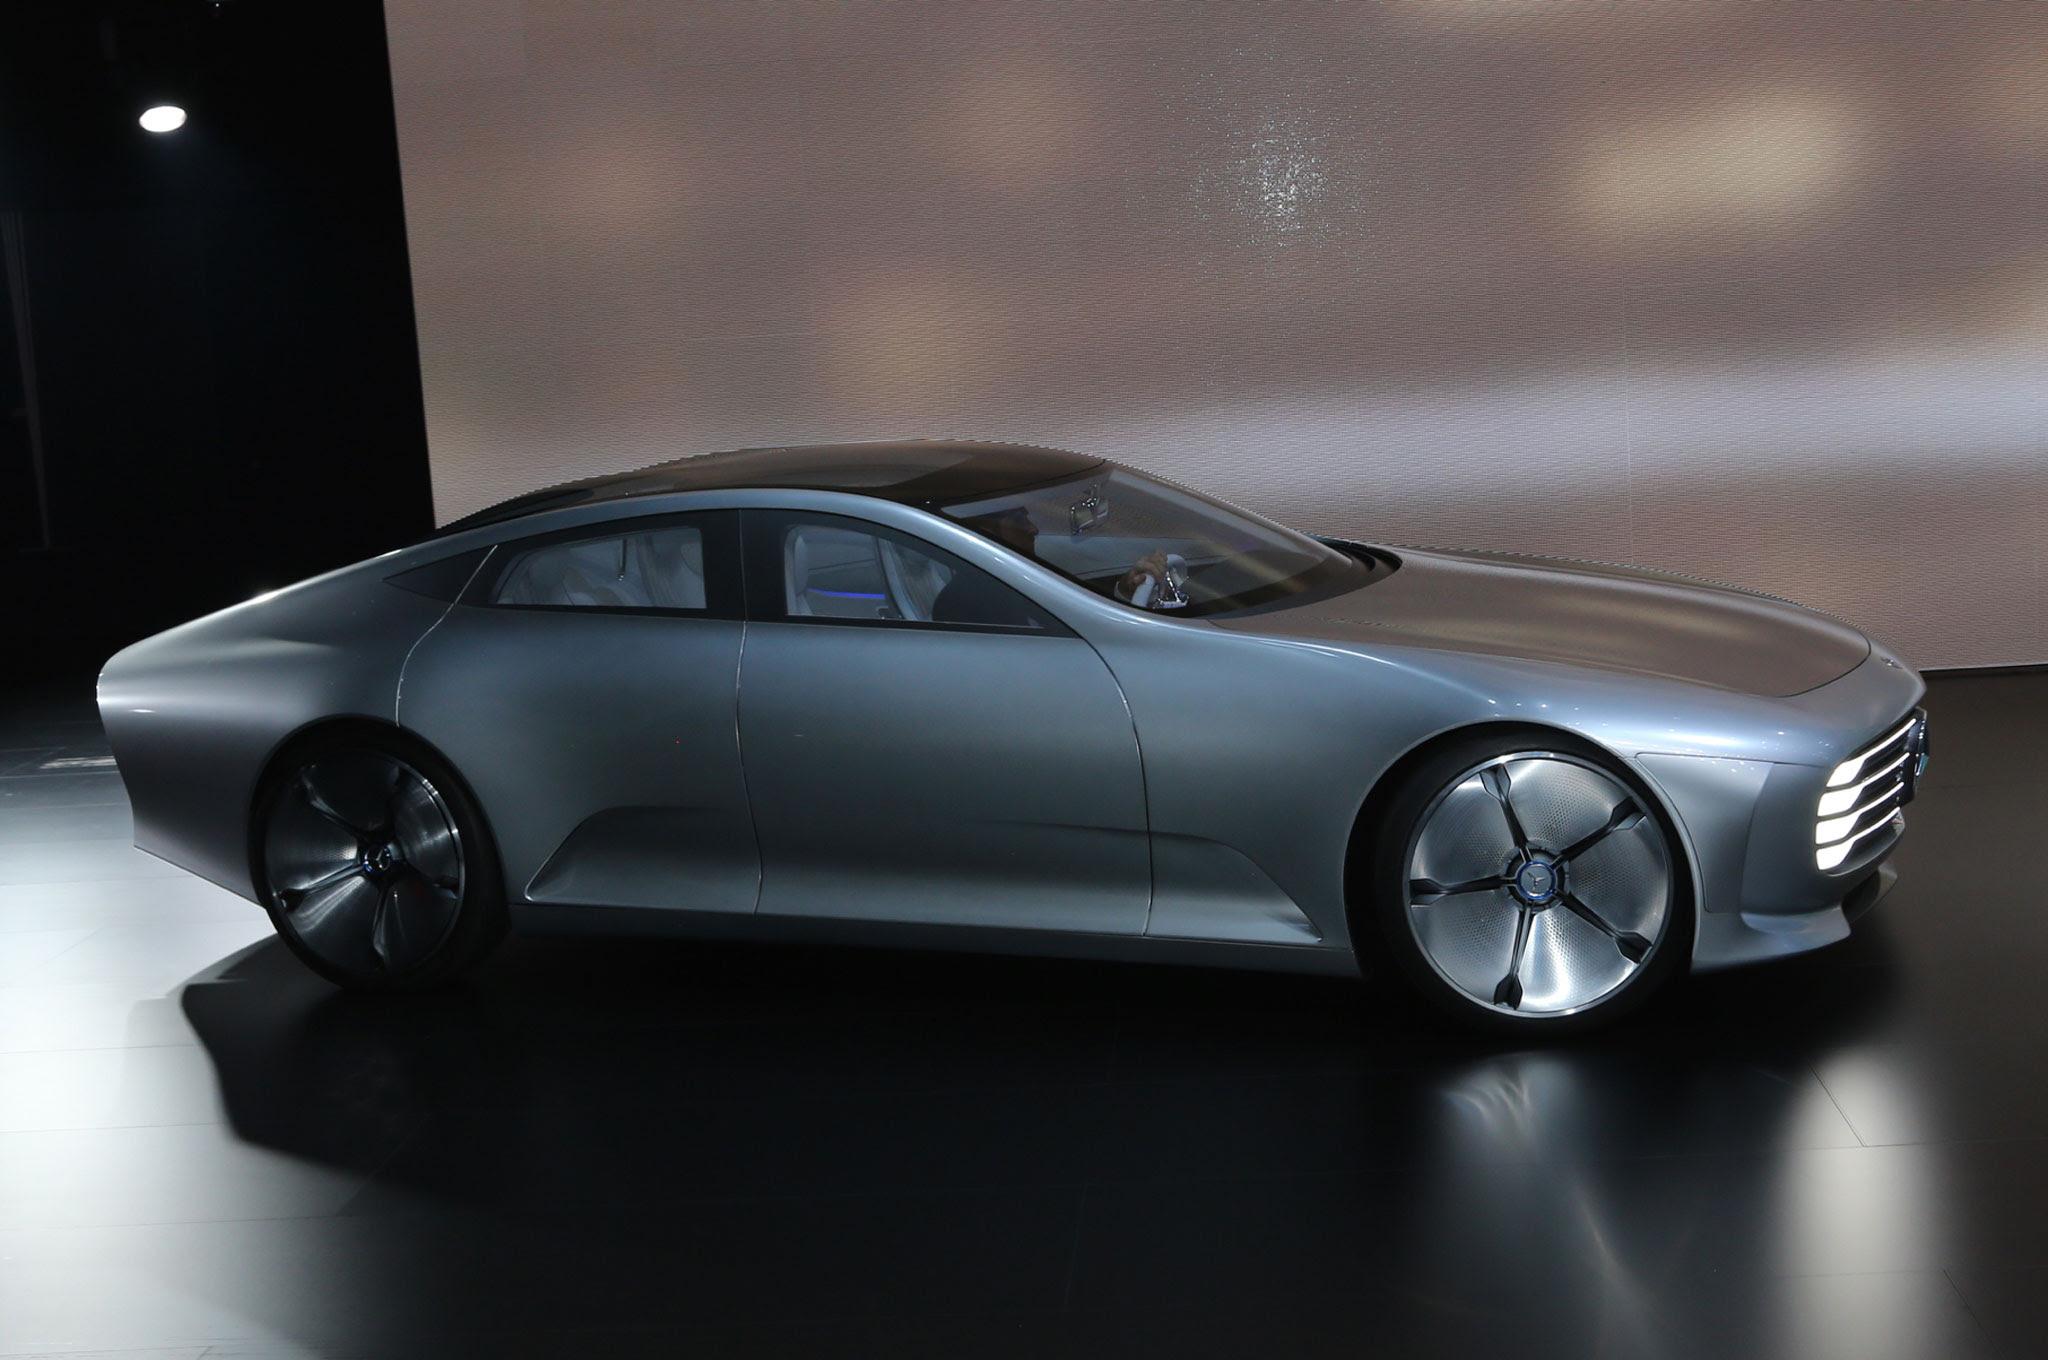 Mercedes-Benz Concept IAA is a Study in Aerodynamics